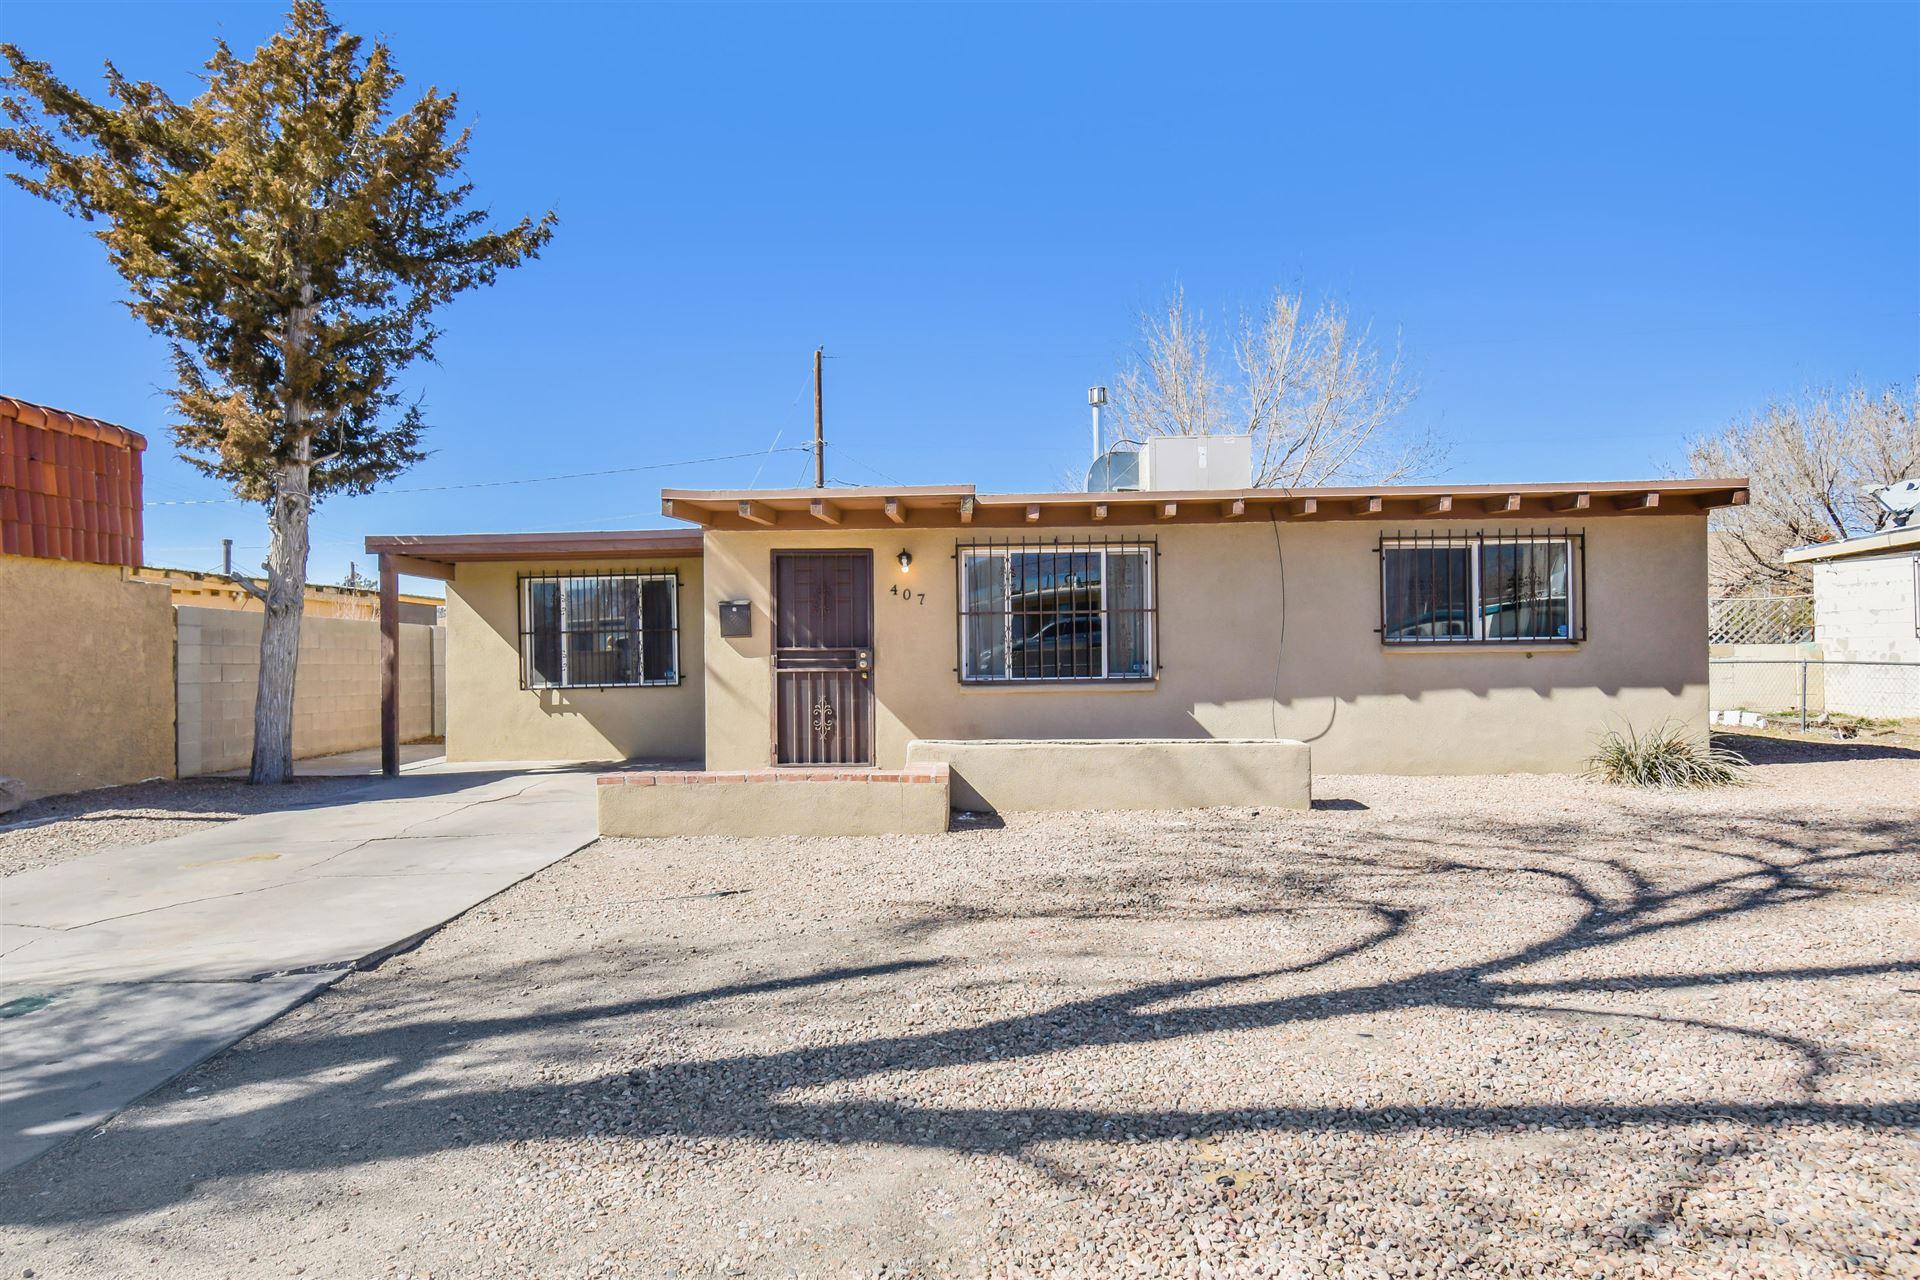 Photo of 407 CHARLESTON Street NE, Albuquerque, NM 87108 (MLS # 986458)